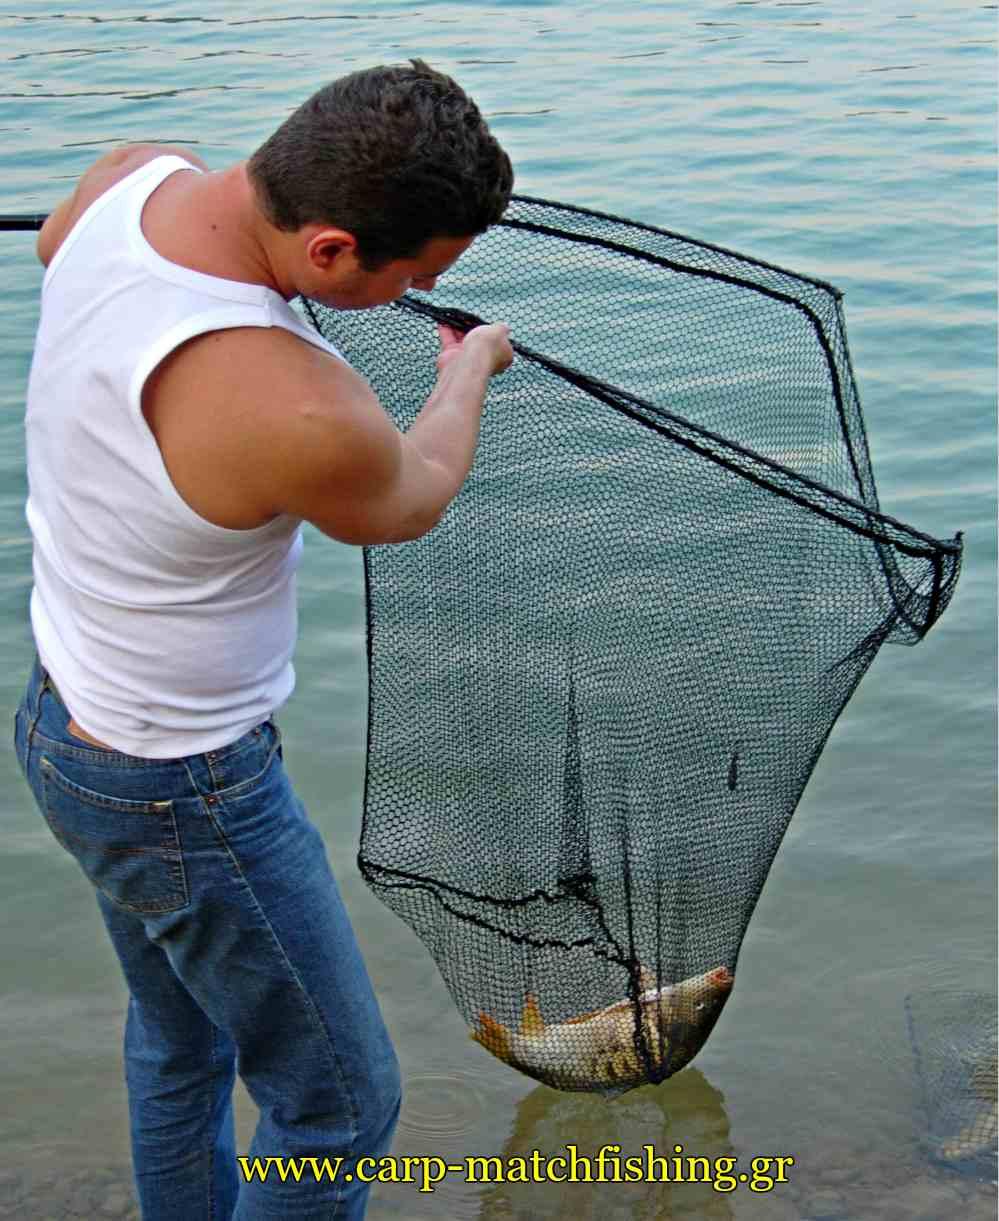 carp-net-catch-and-release-carpmatchfishing